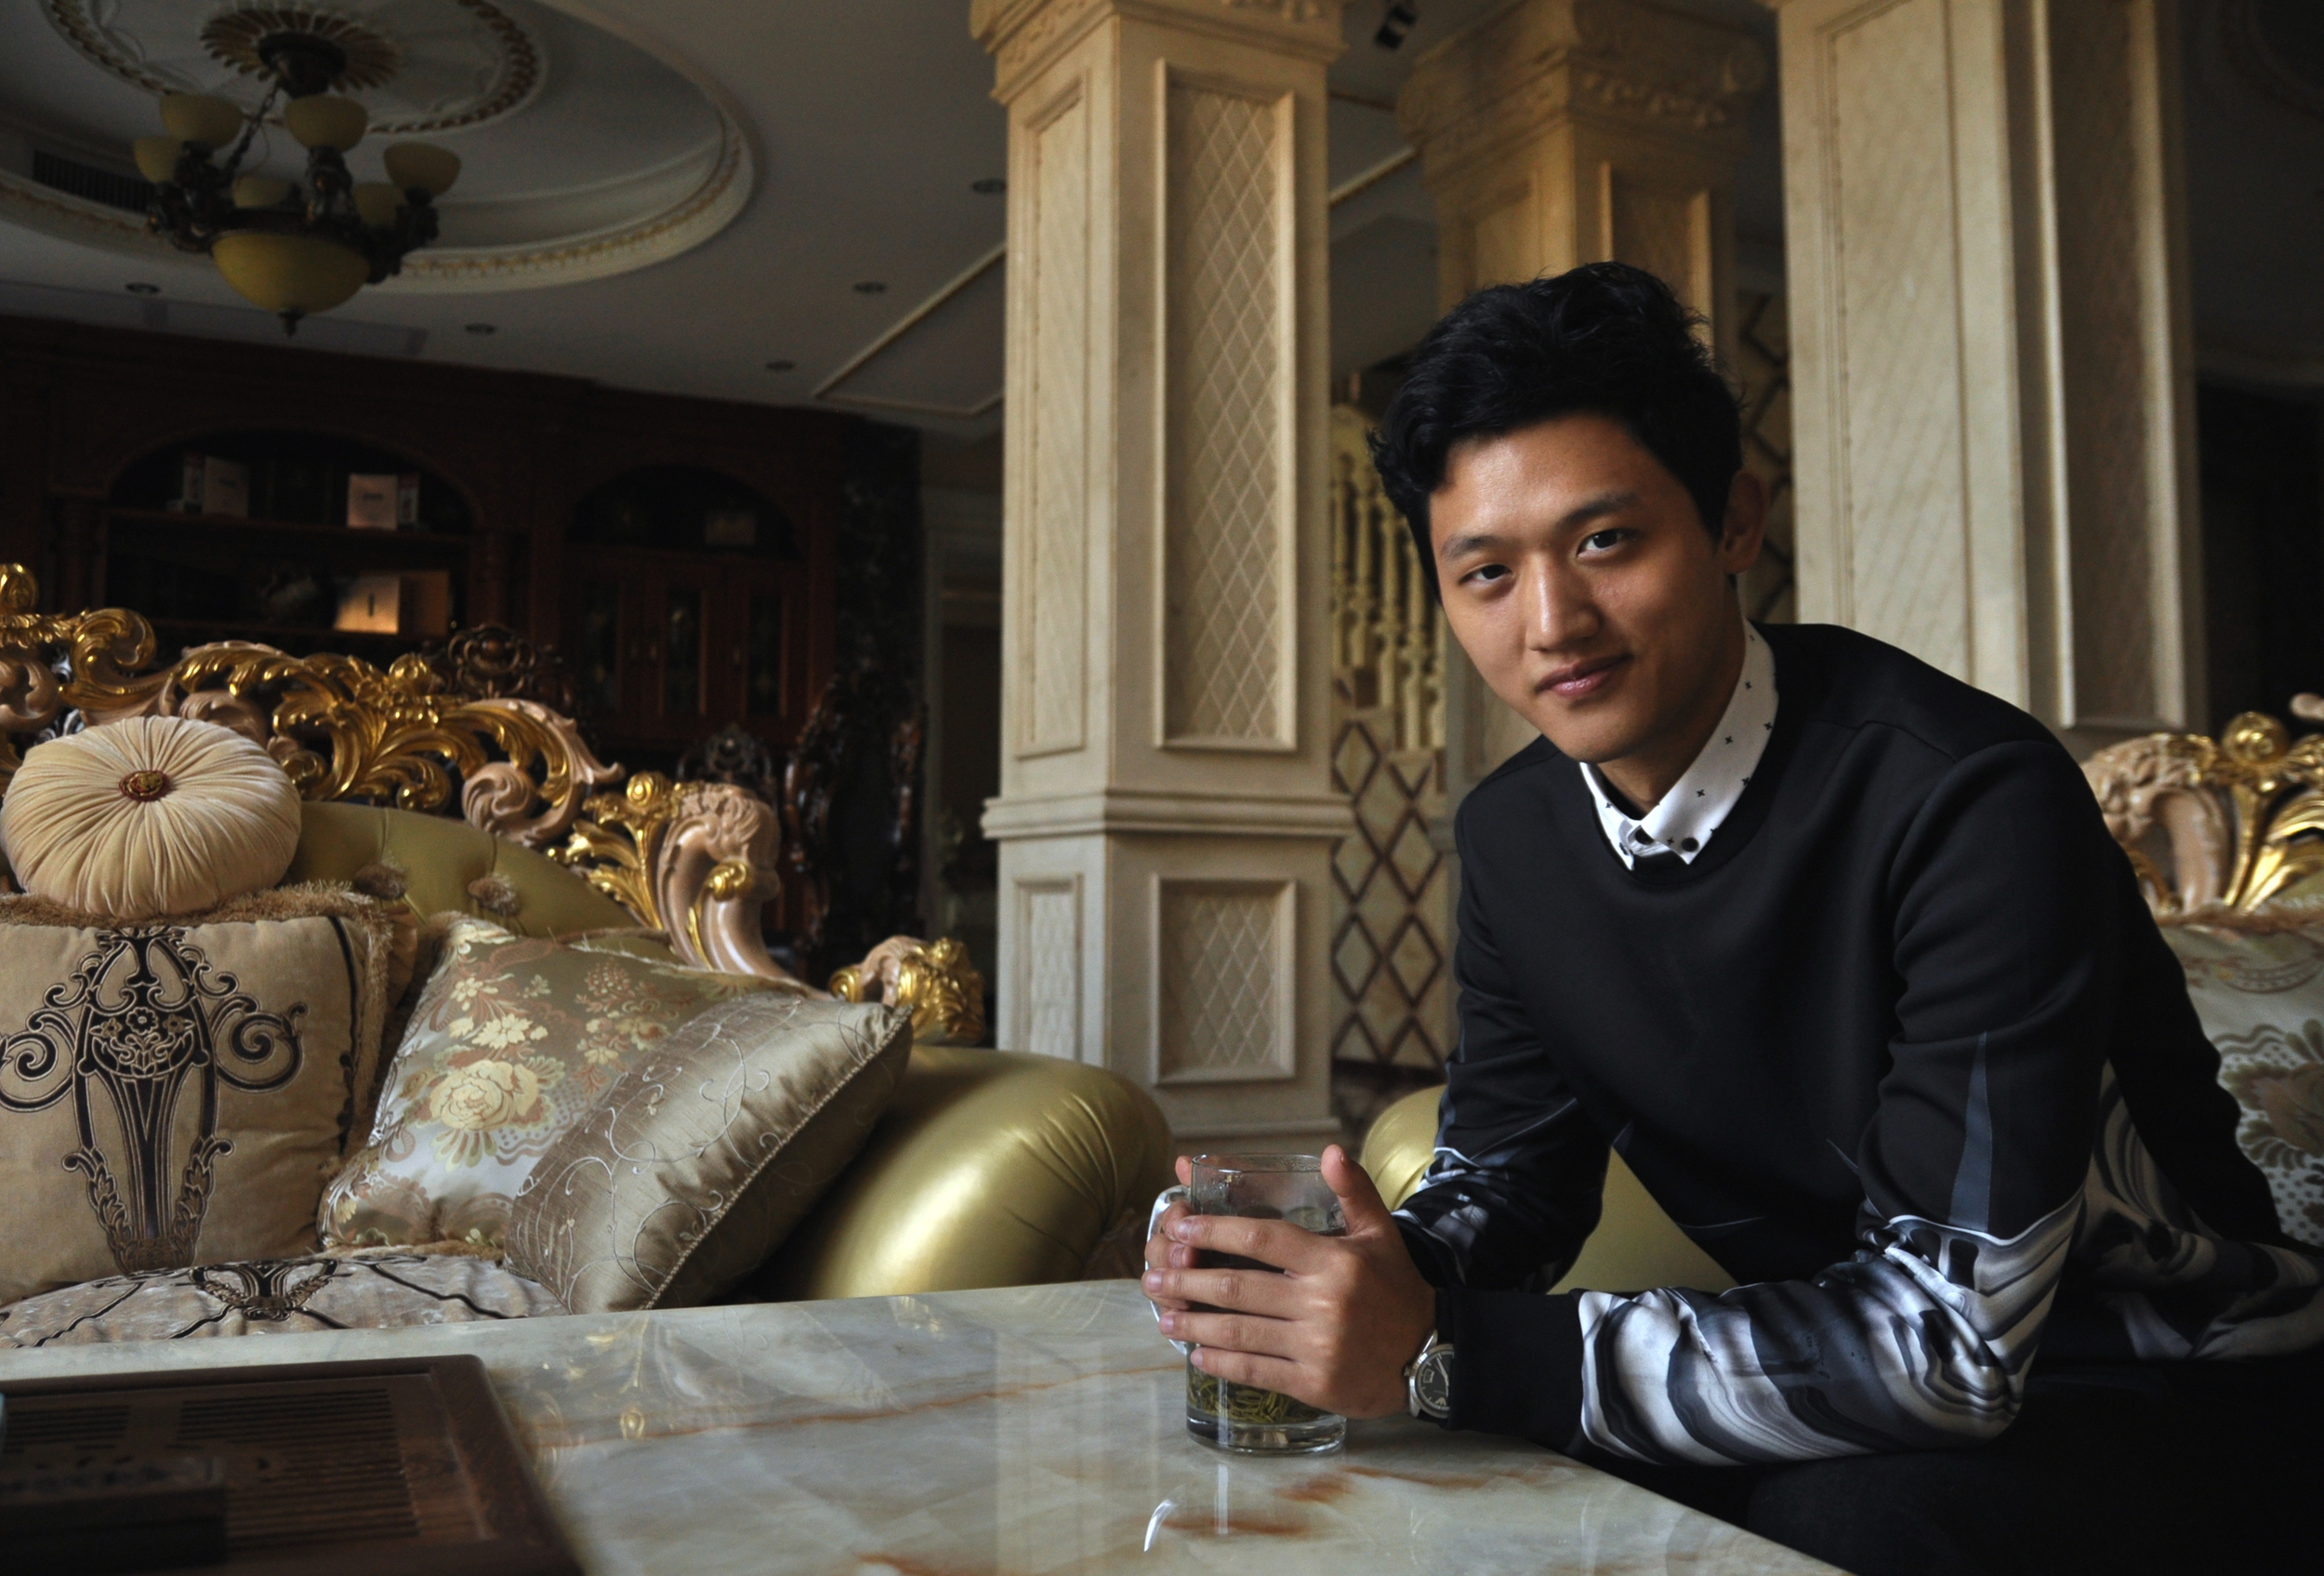 Chen Zhao, Wuhan University student 2015